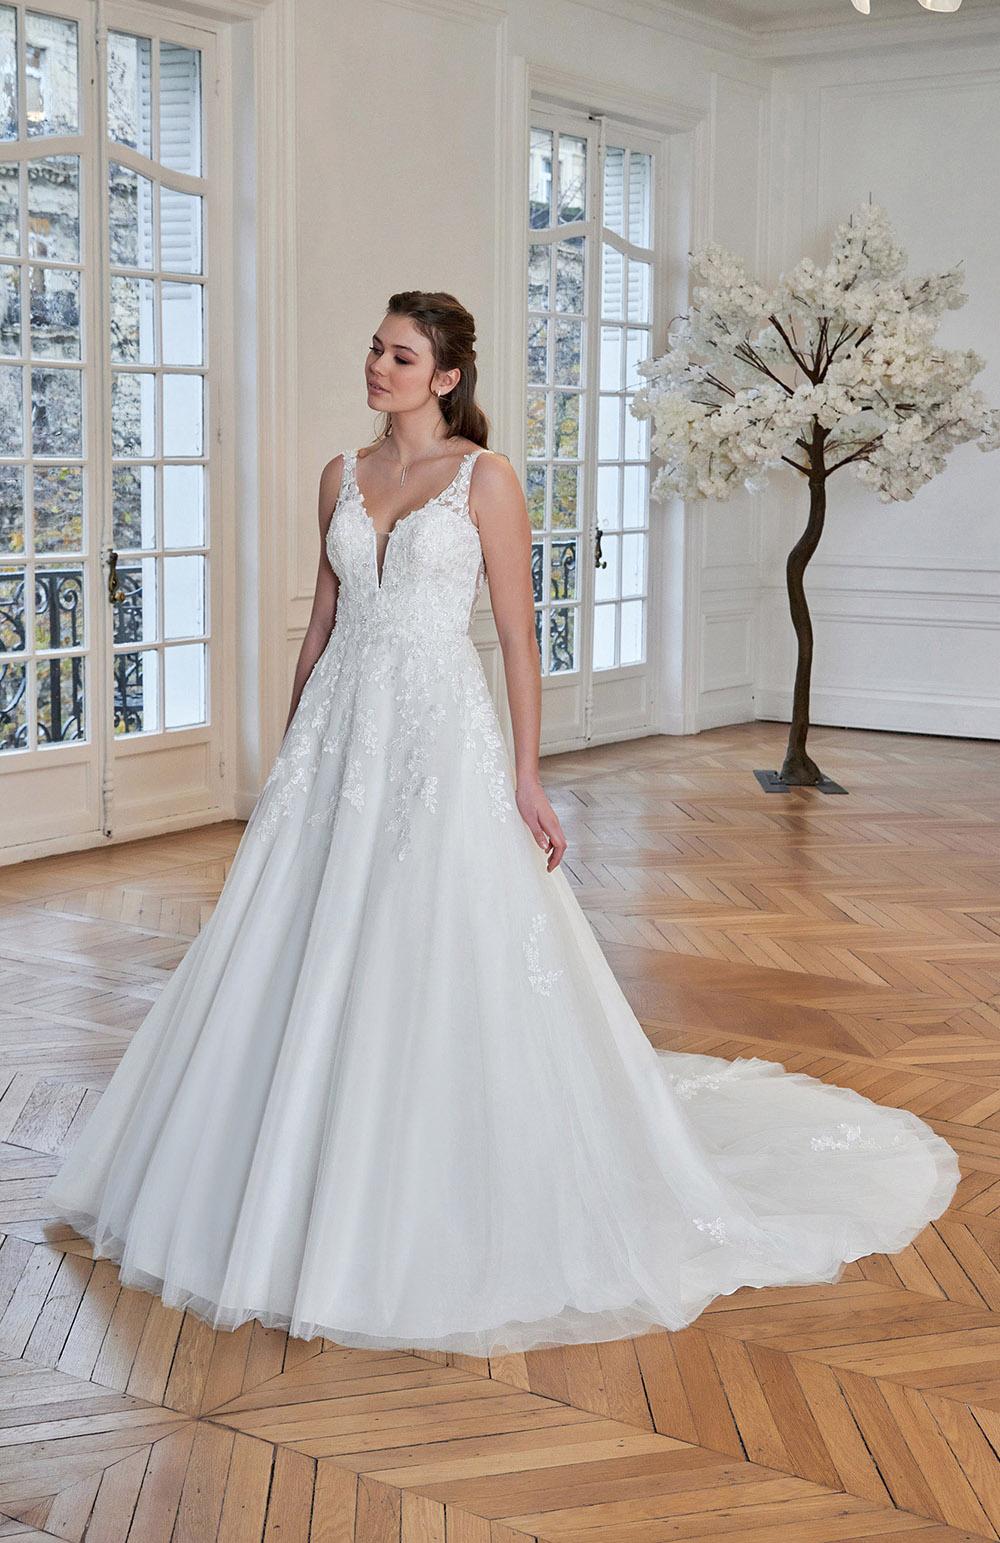 Robe de mariée Modèle Esha